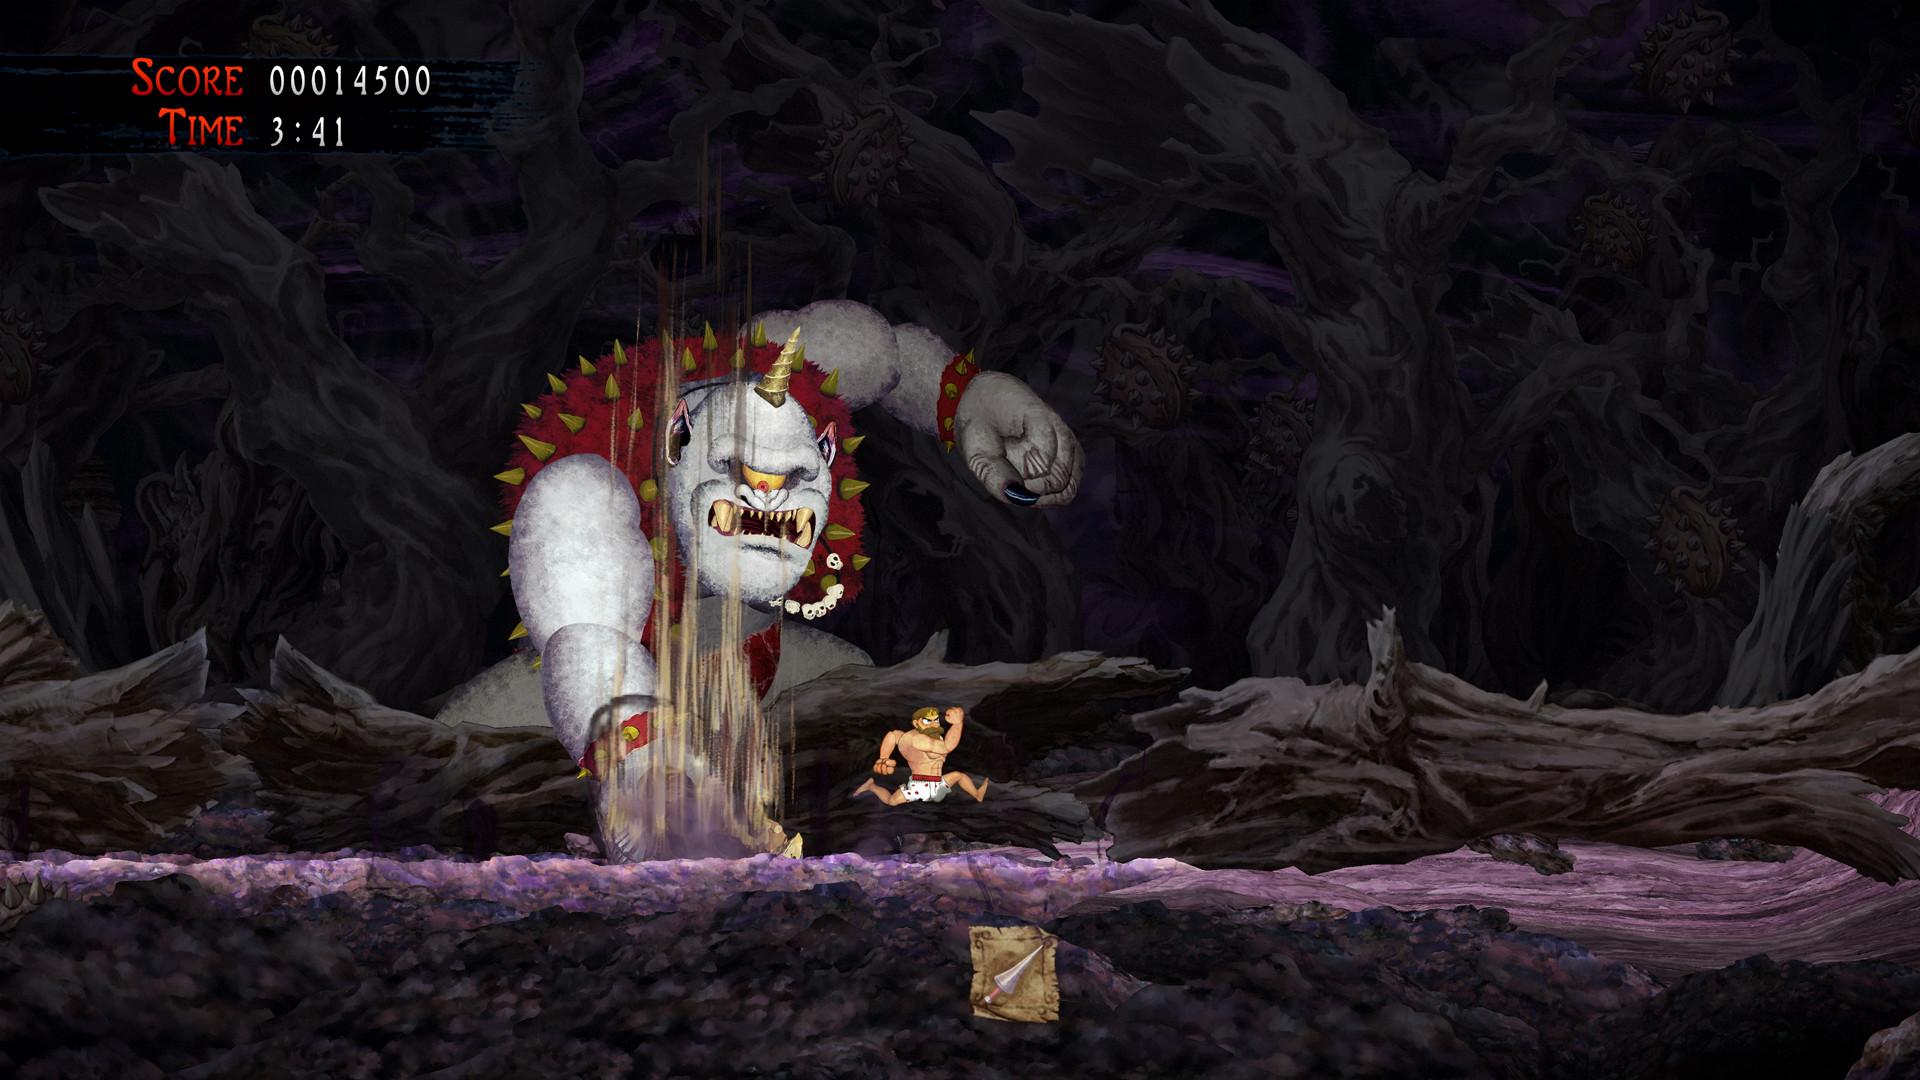 经典回归 魔界村-重制版/Ghosts n Goblins Resurrection(Build.6580247+预约特典)插图4